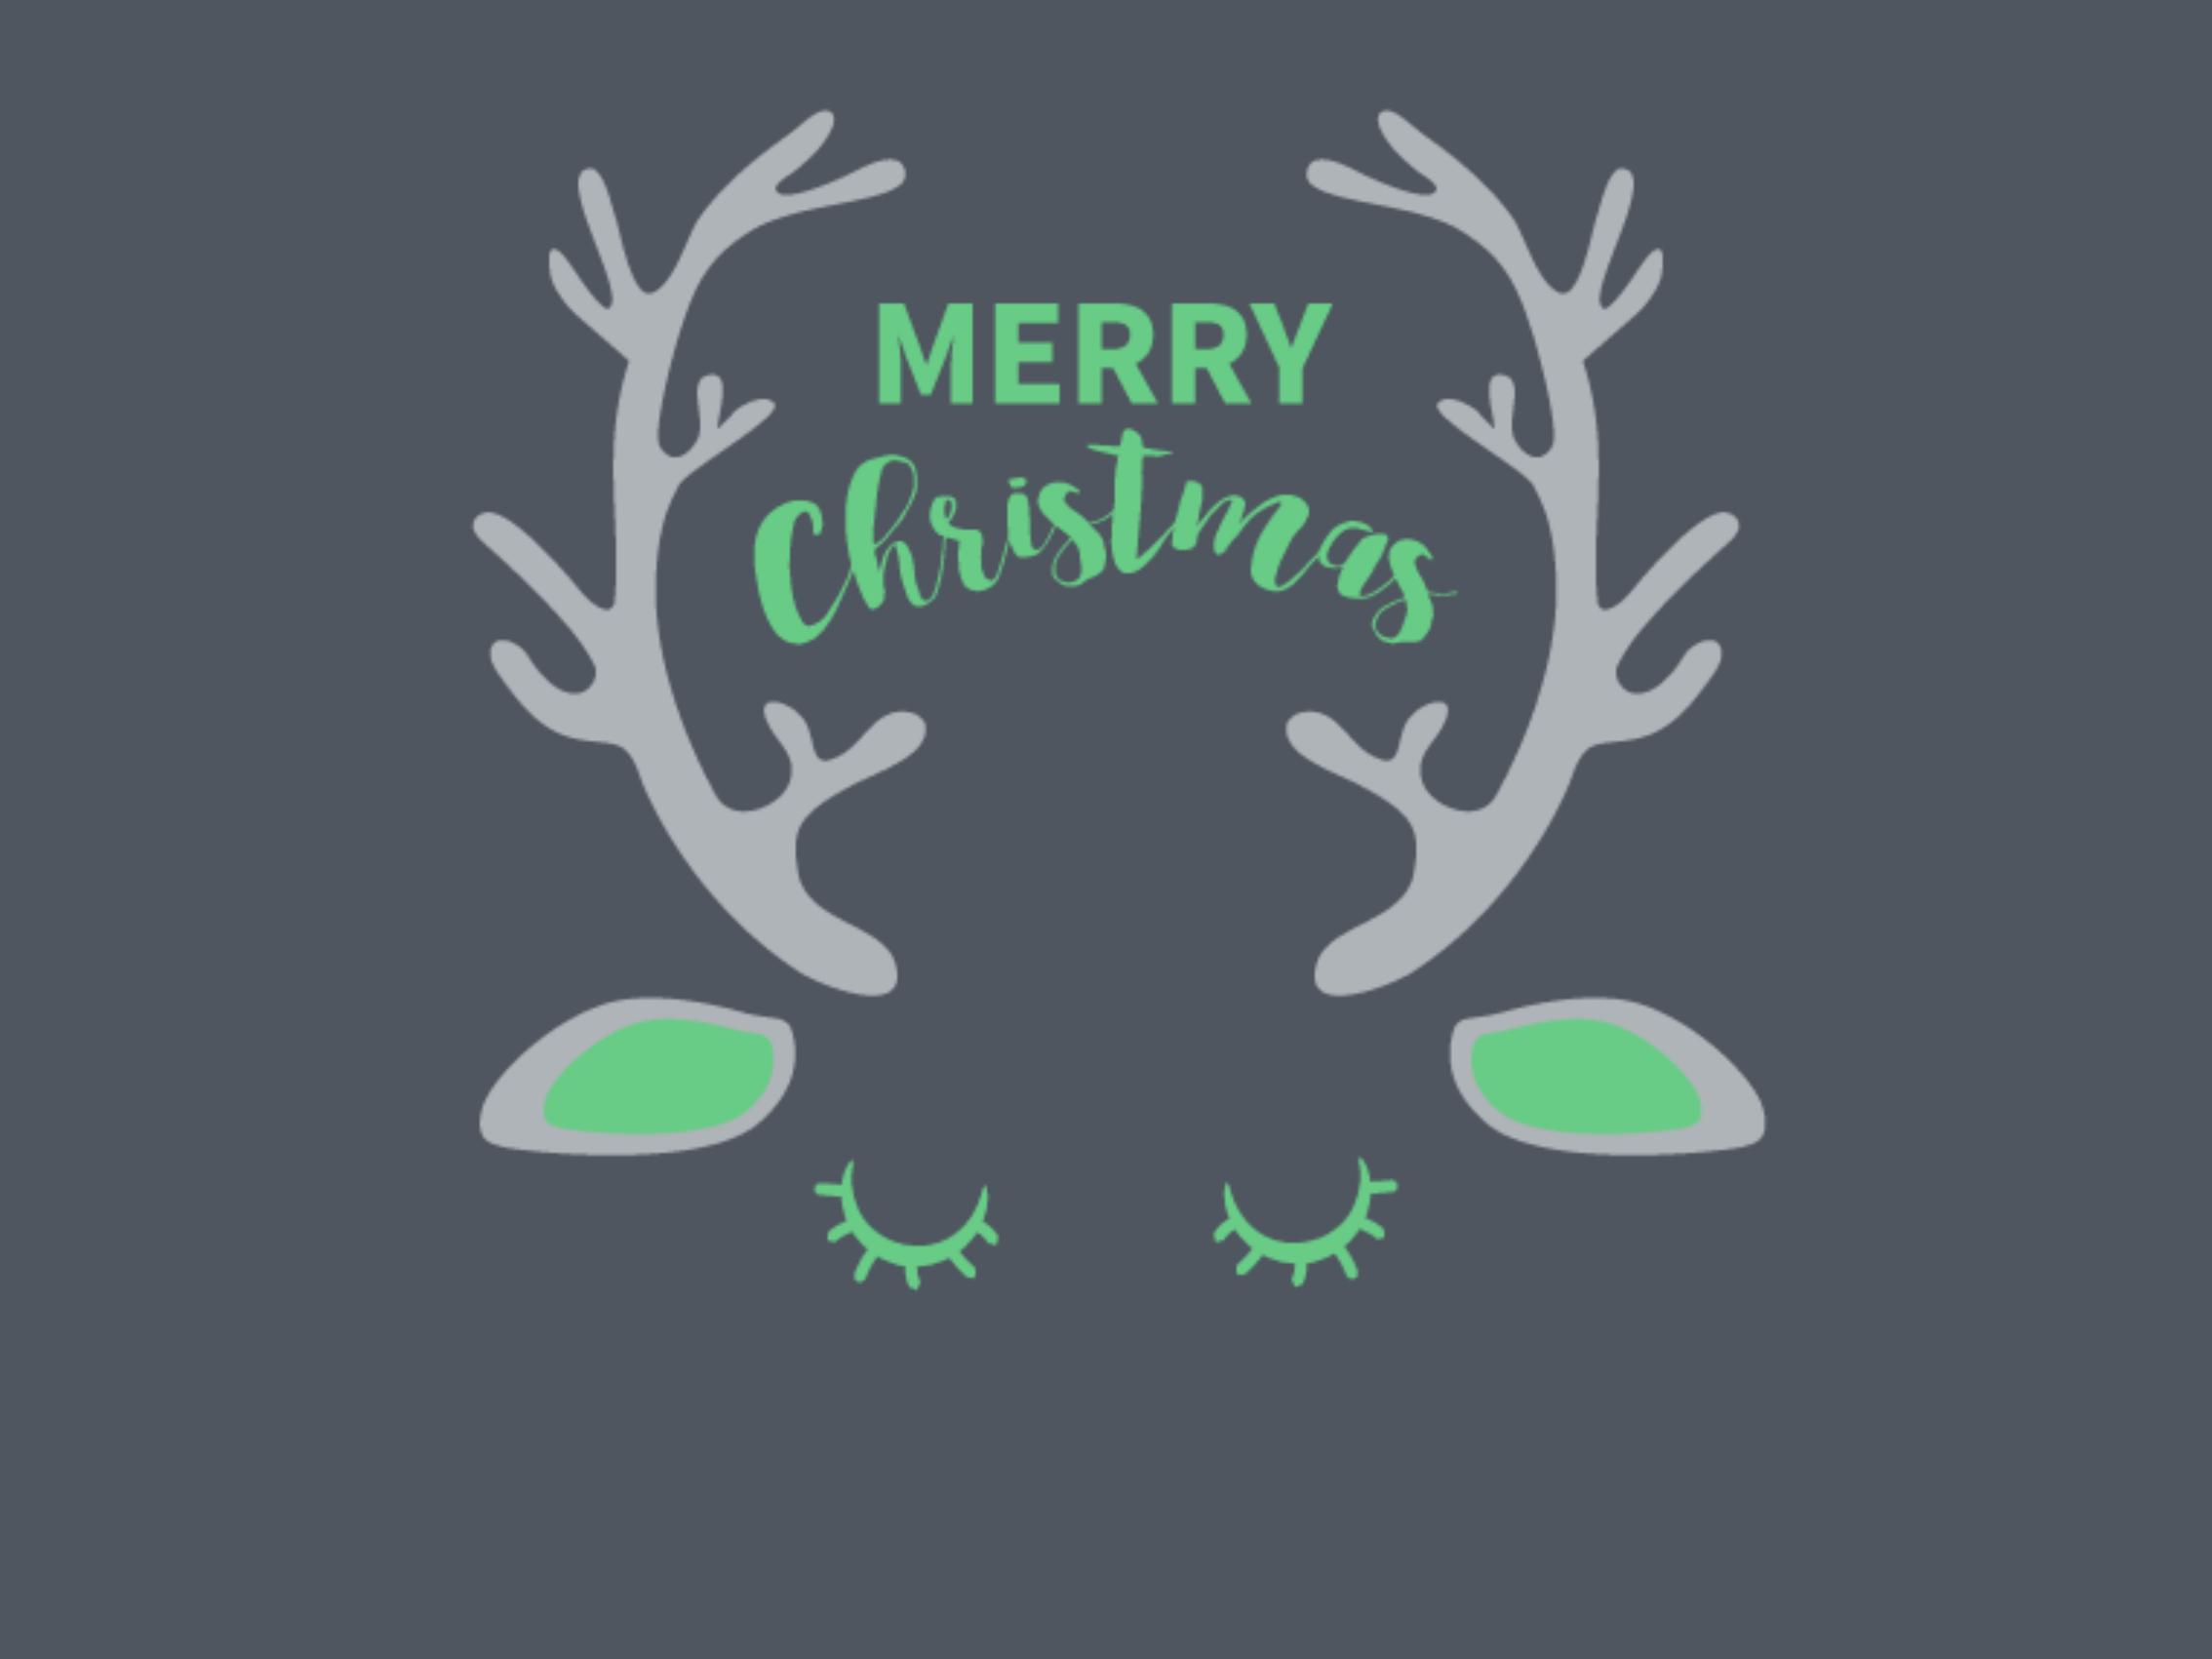 Merry Christmas 999-1817